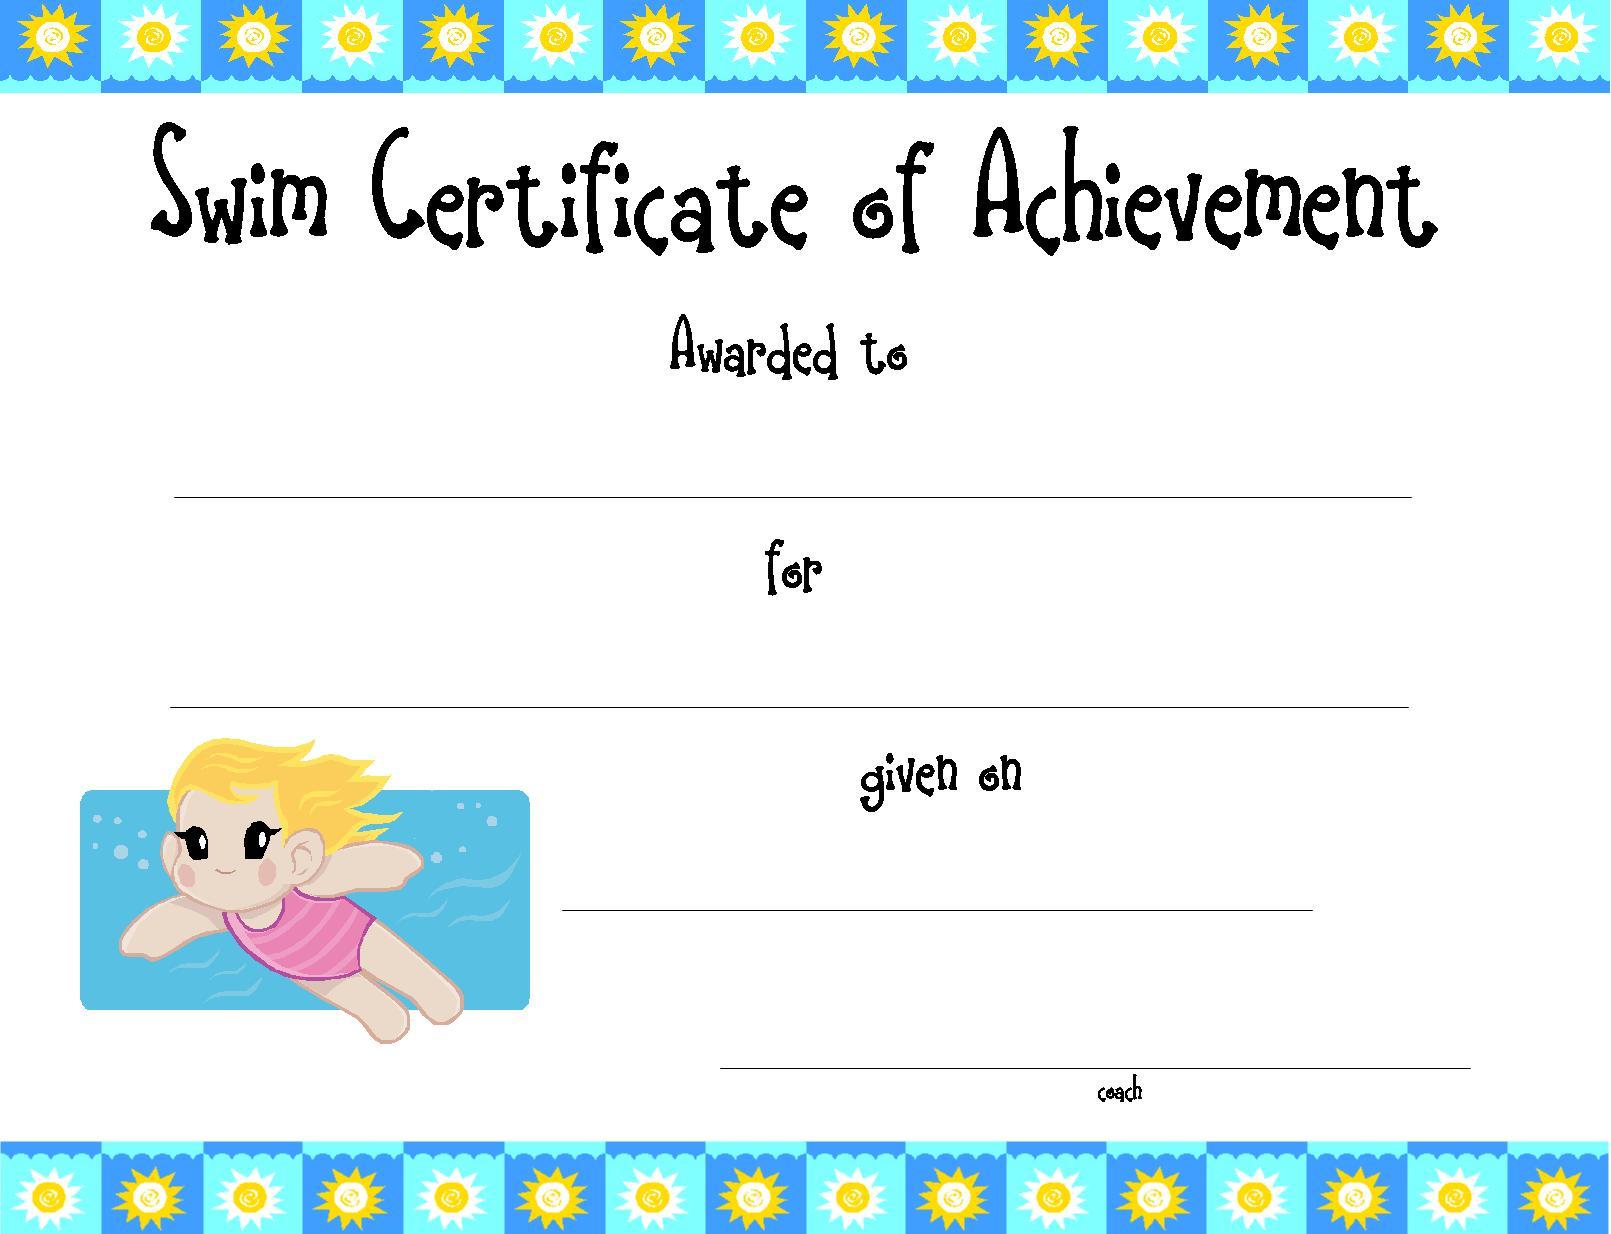 Swimming certificate template peelland fm swimming certificate template yelopaper Gallery